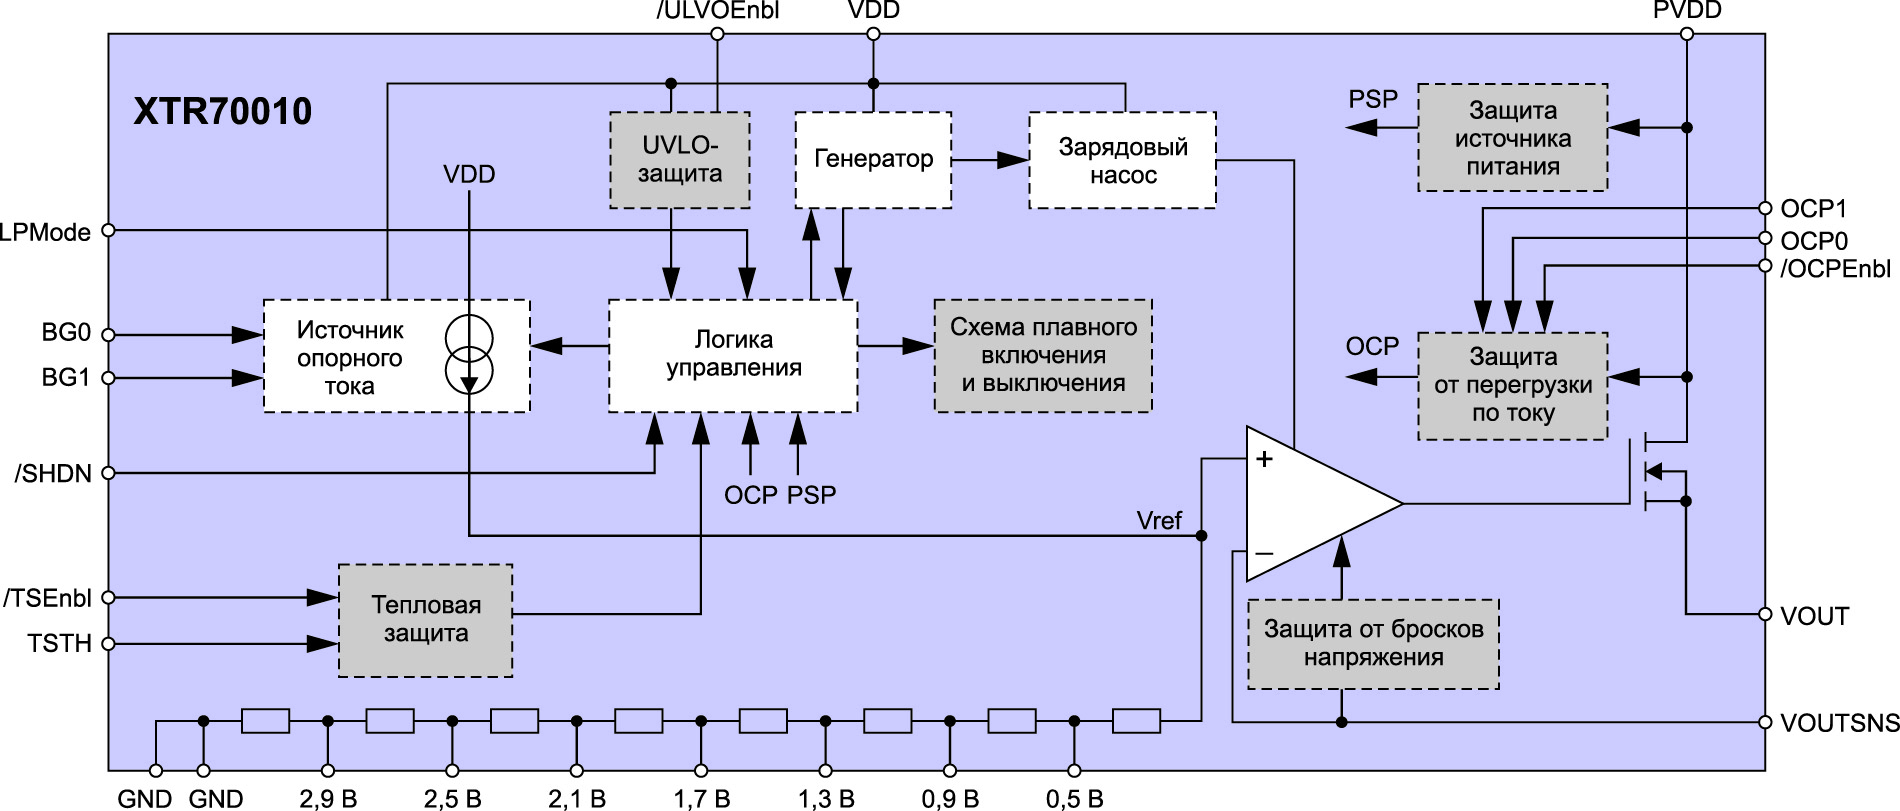 Внутренняя структура стабилизатора XTR70010